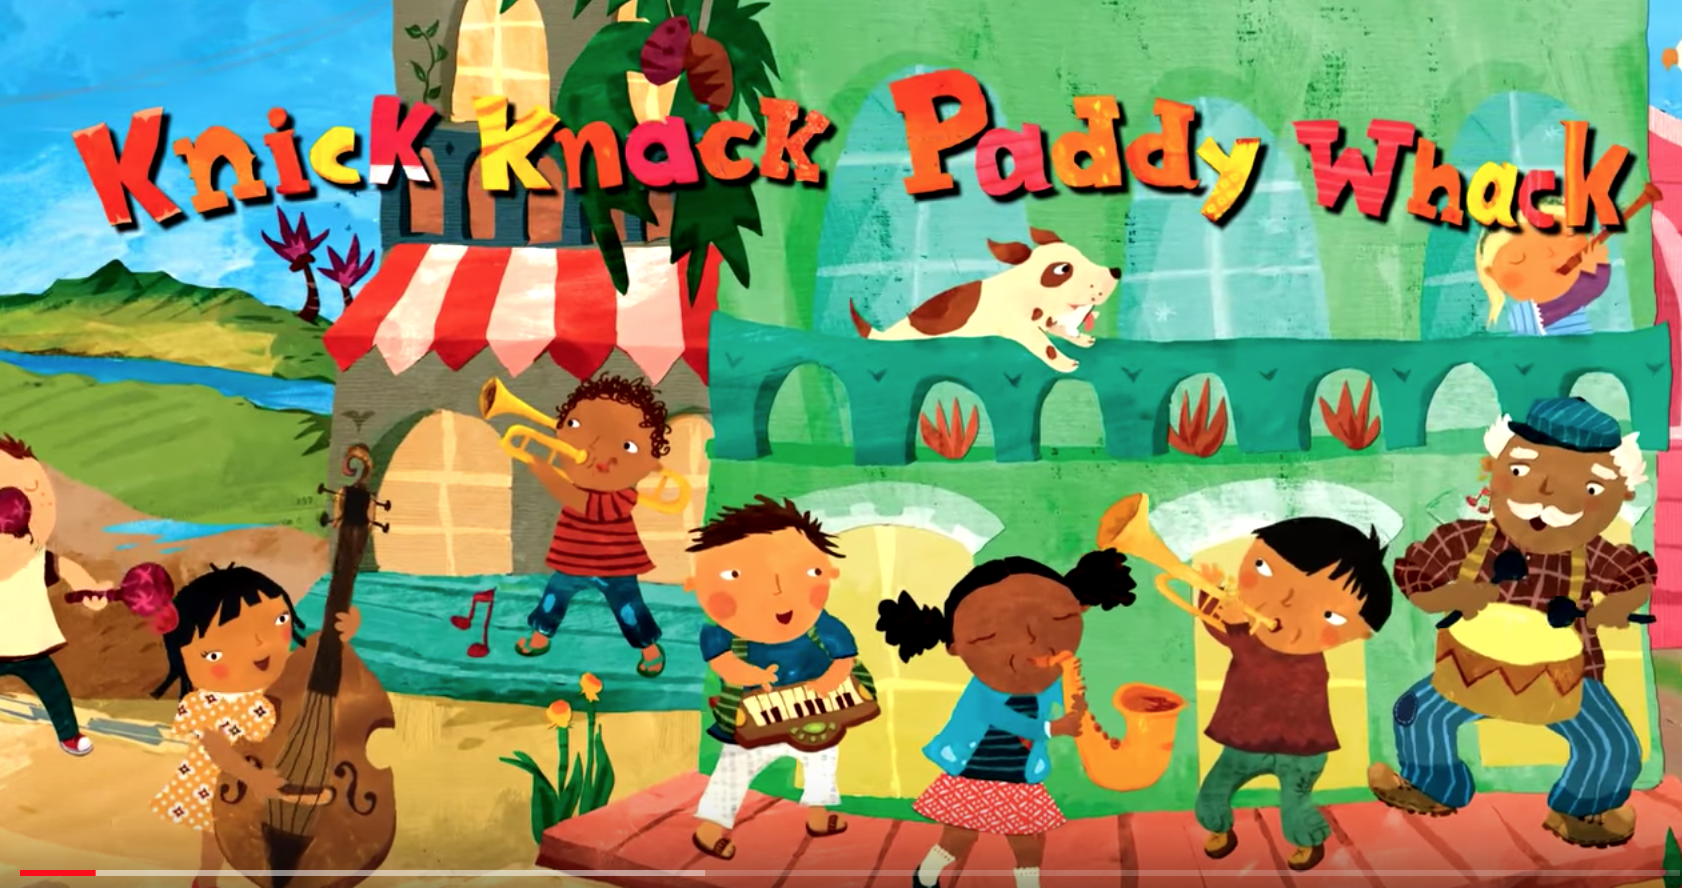 Knick Knack Paddy Whack Barefoot Books